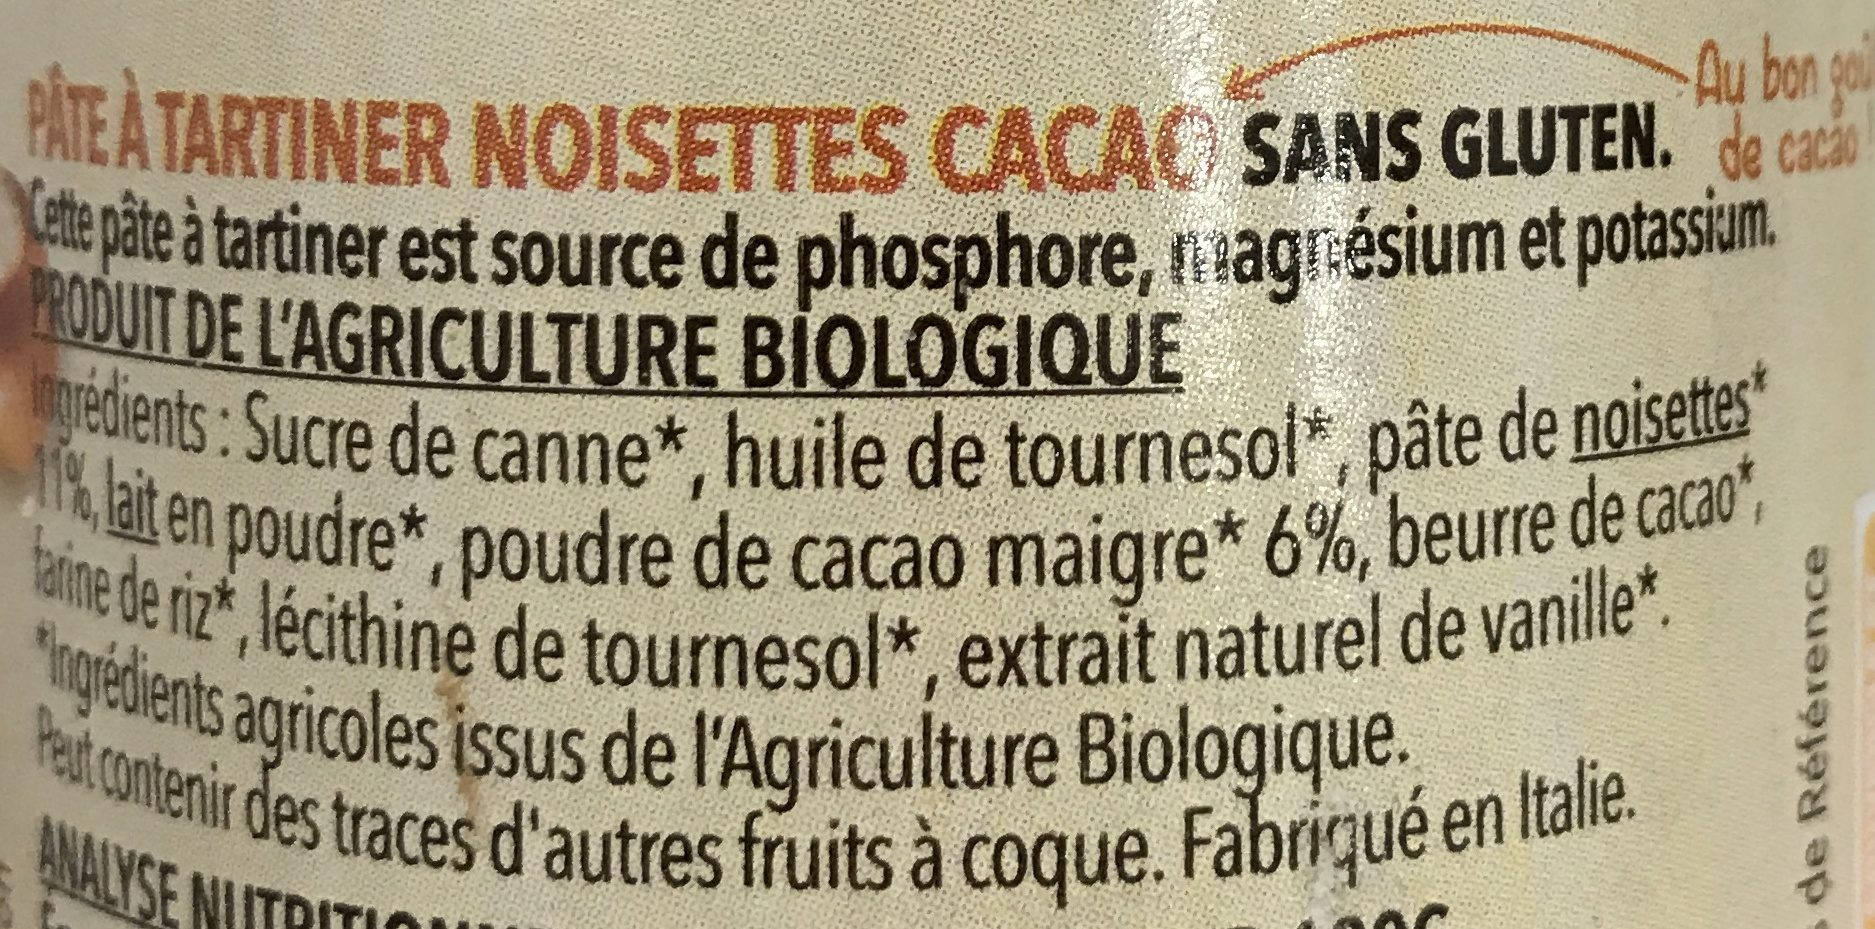 Pâte à tartiner noisettes cacao - Ingredienti - fr